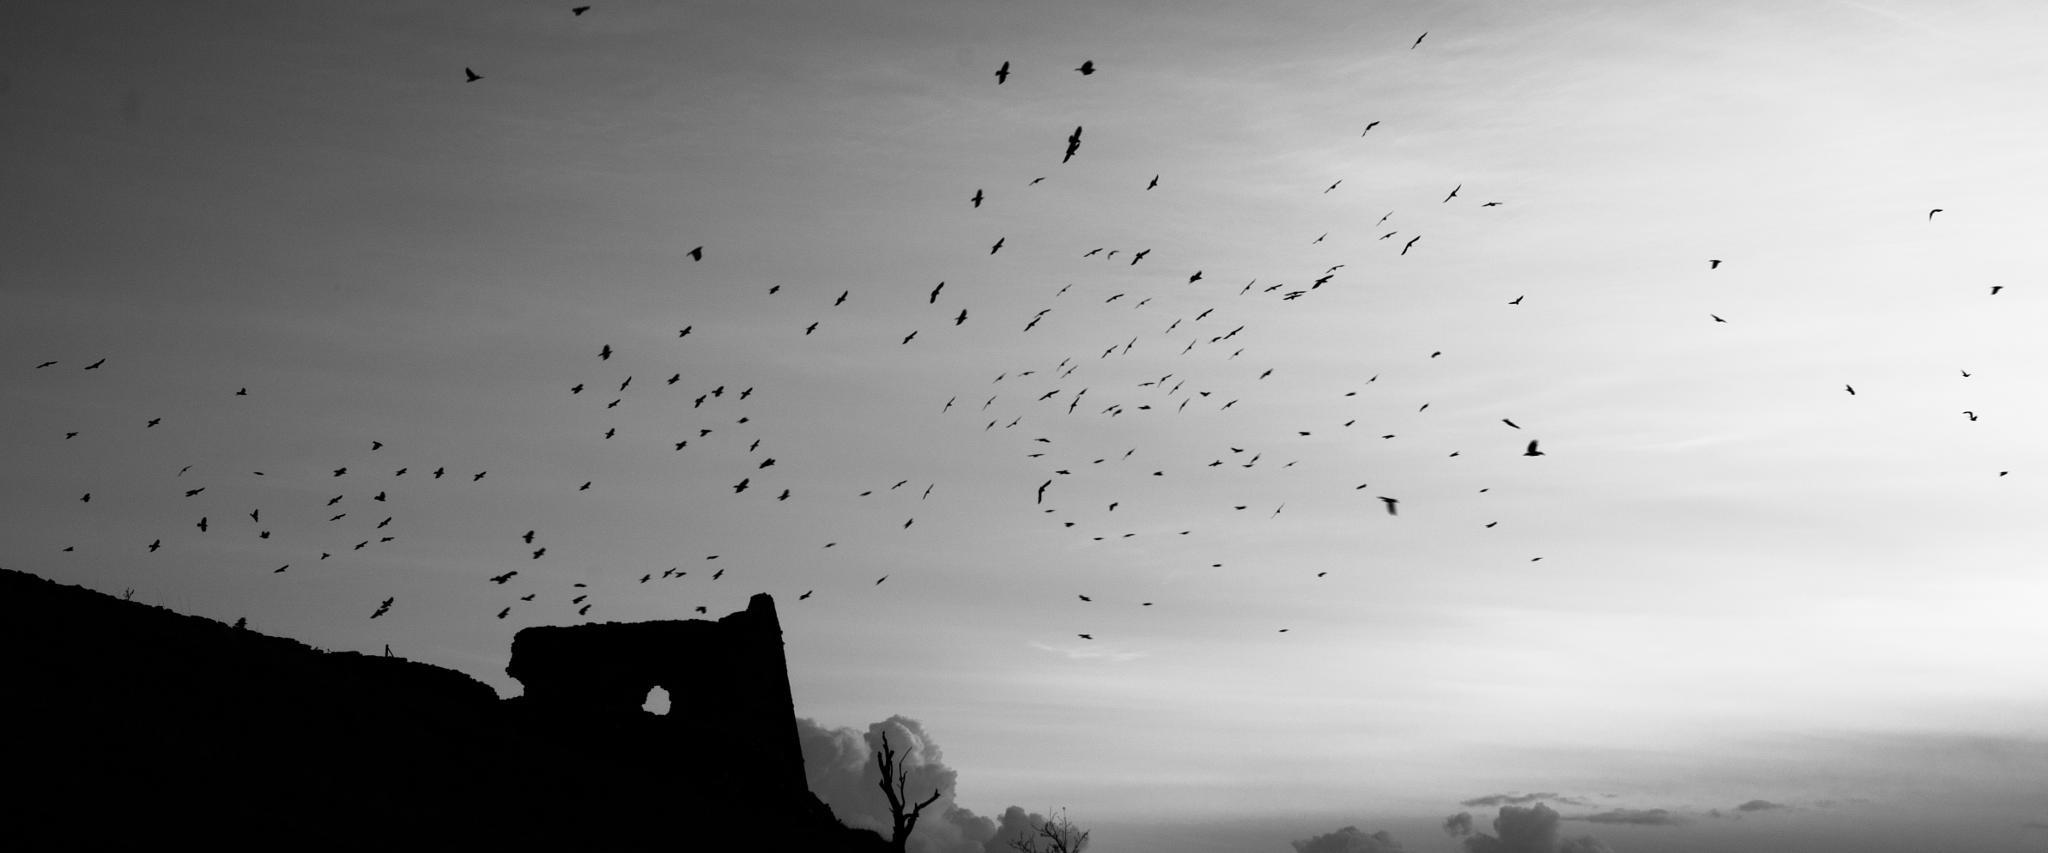 Spooked by Grant Hyatt